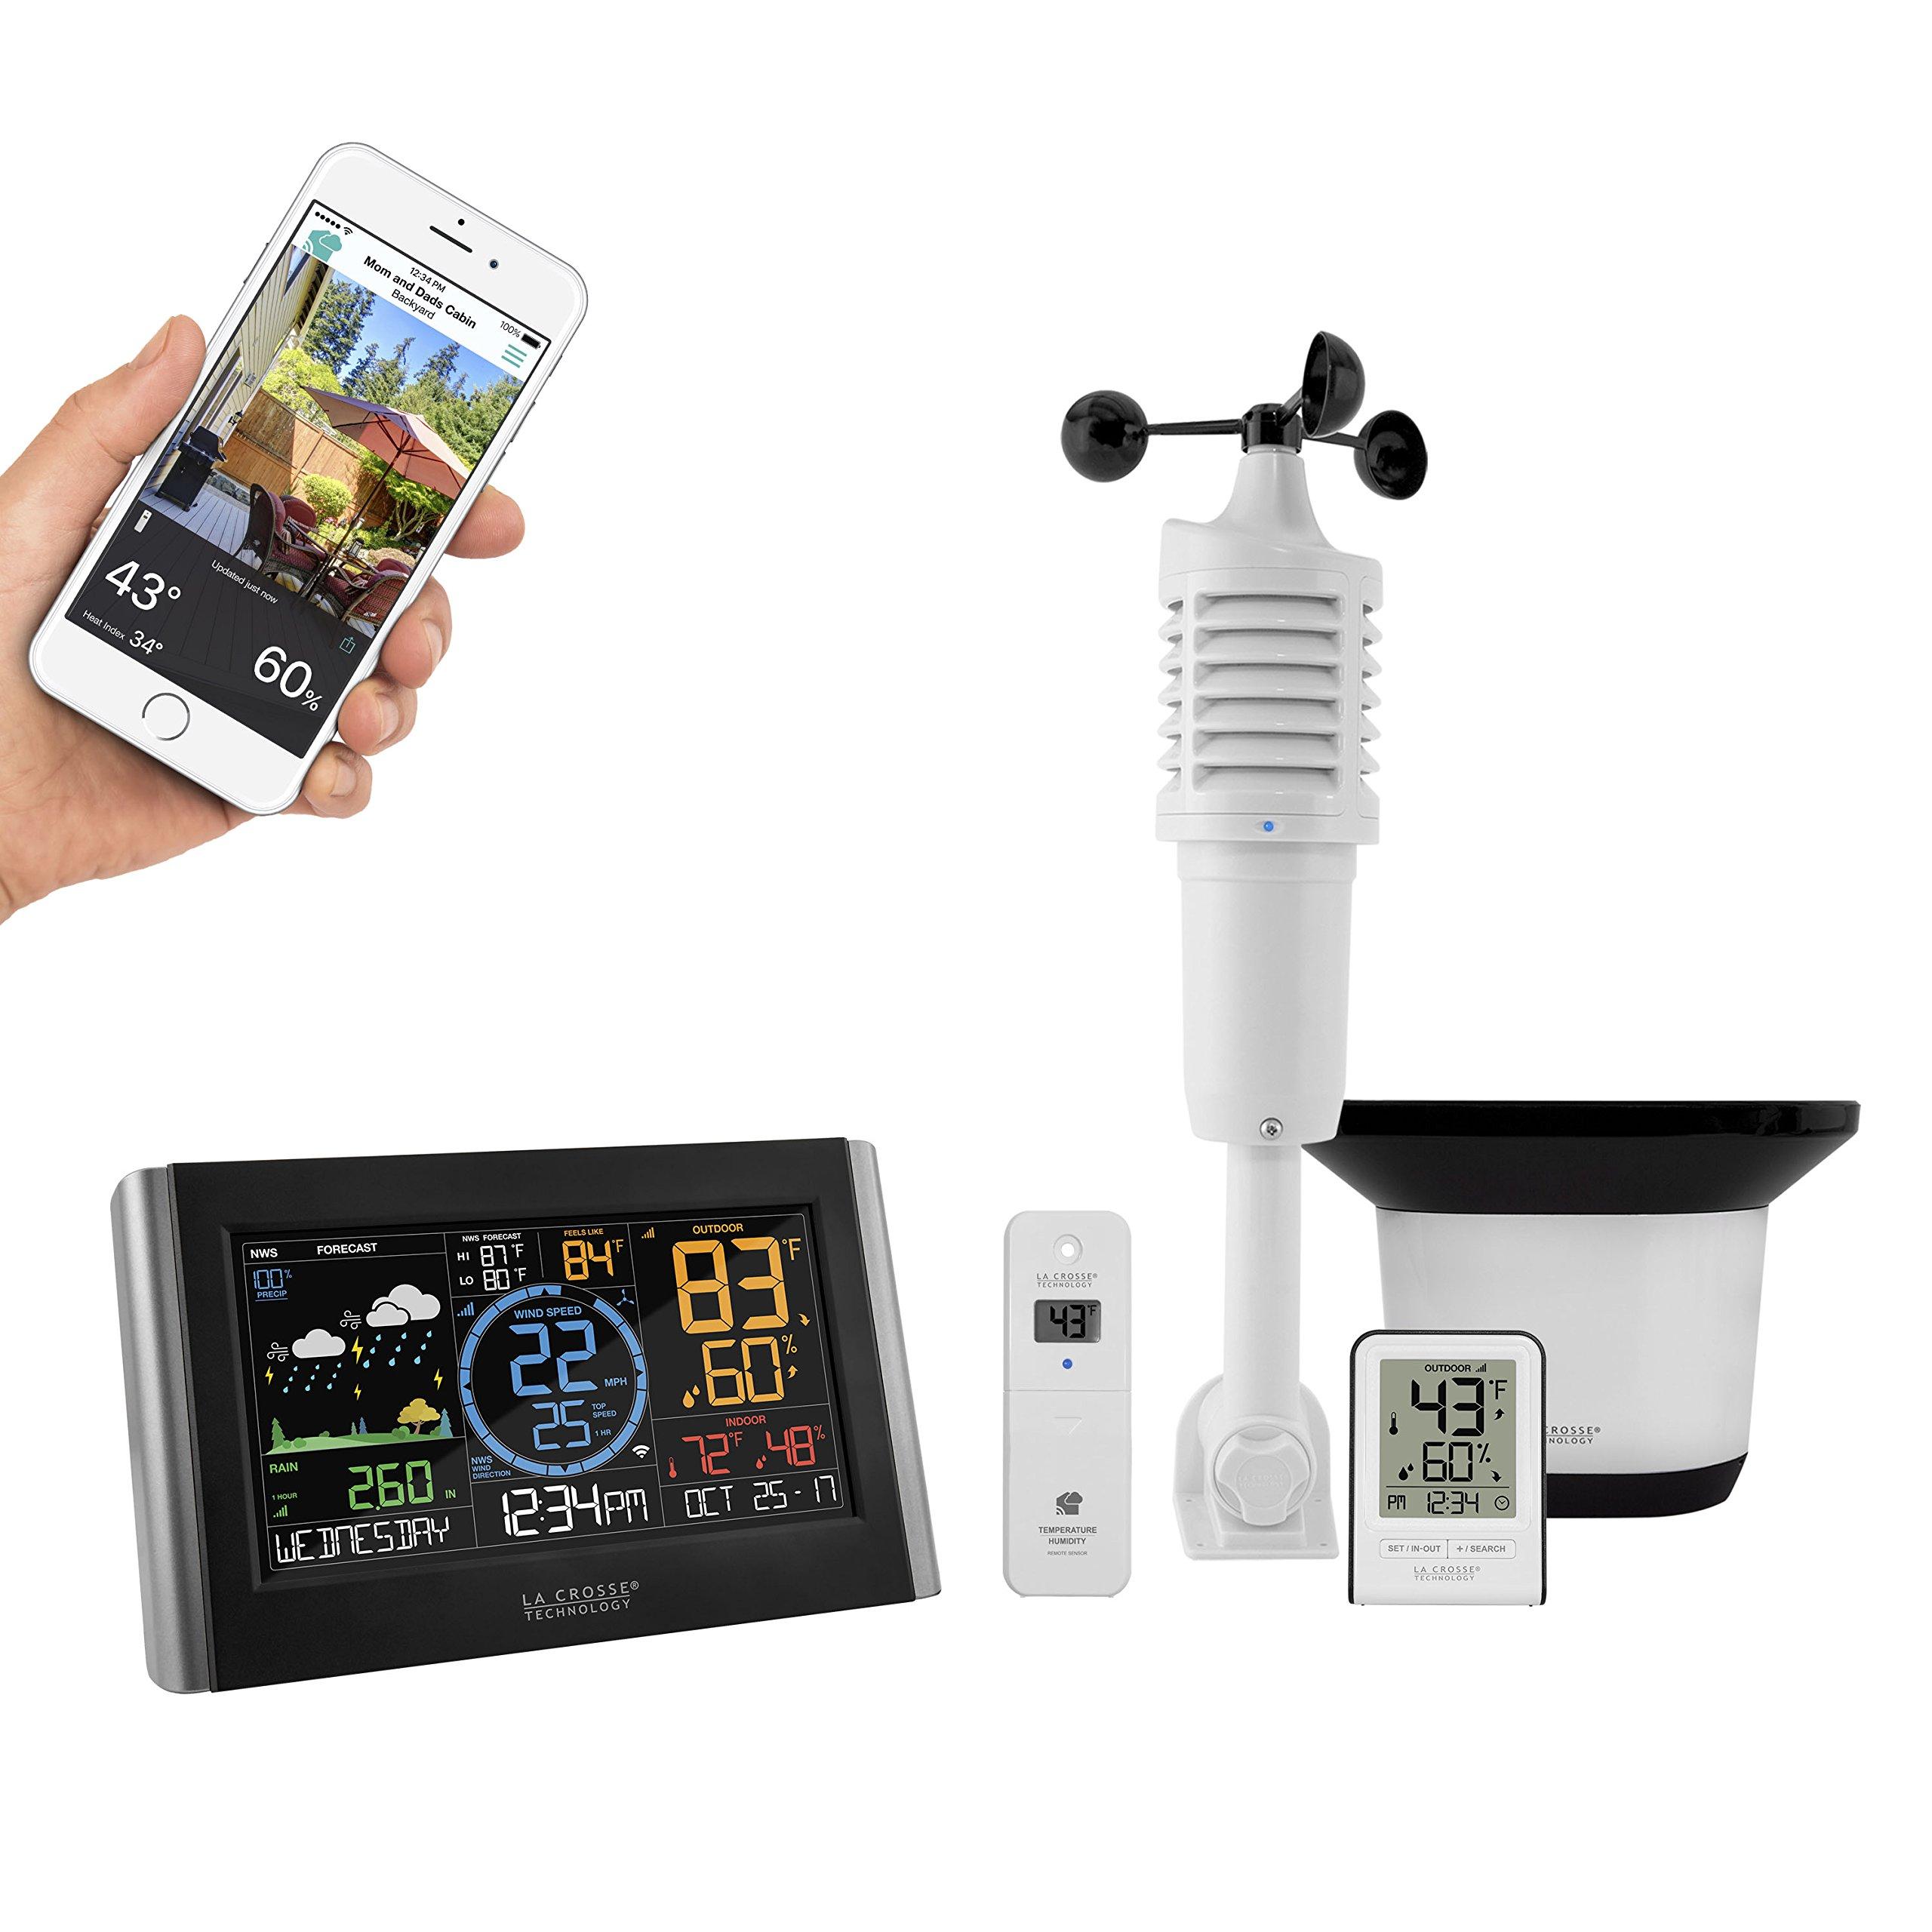 La Crosse Technology V22-WRTH-INT Professional Weather Station, Black/Silver